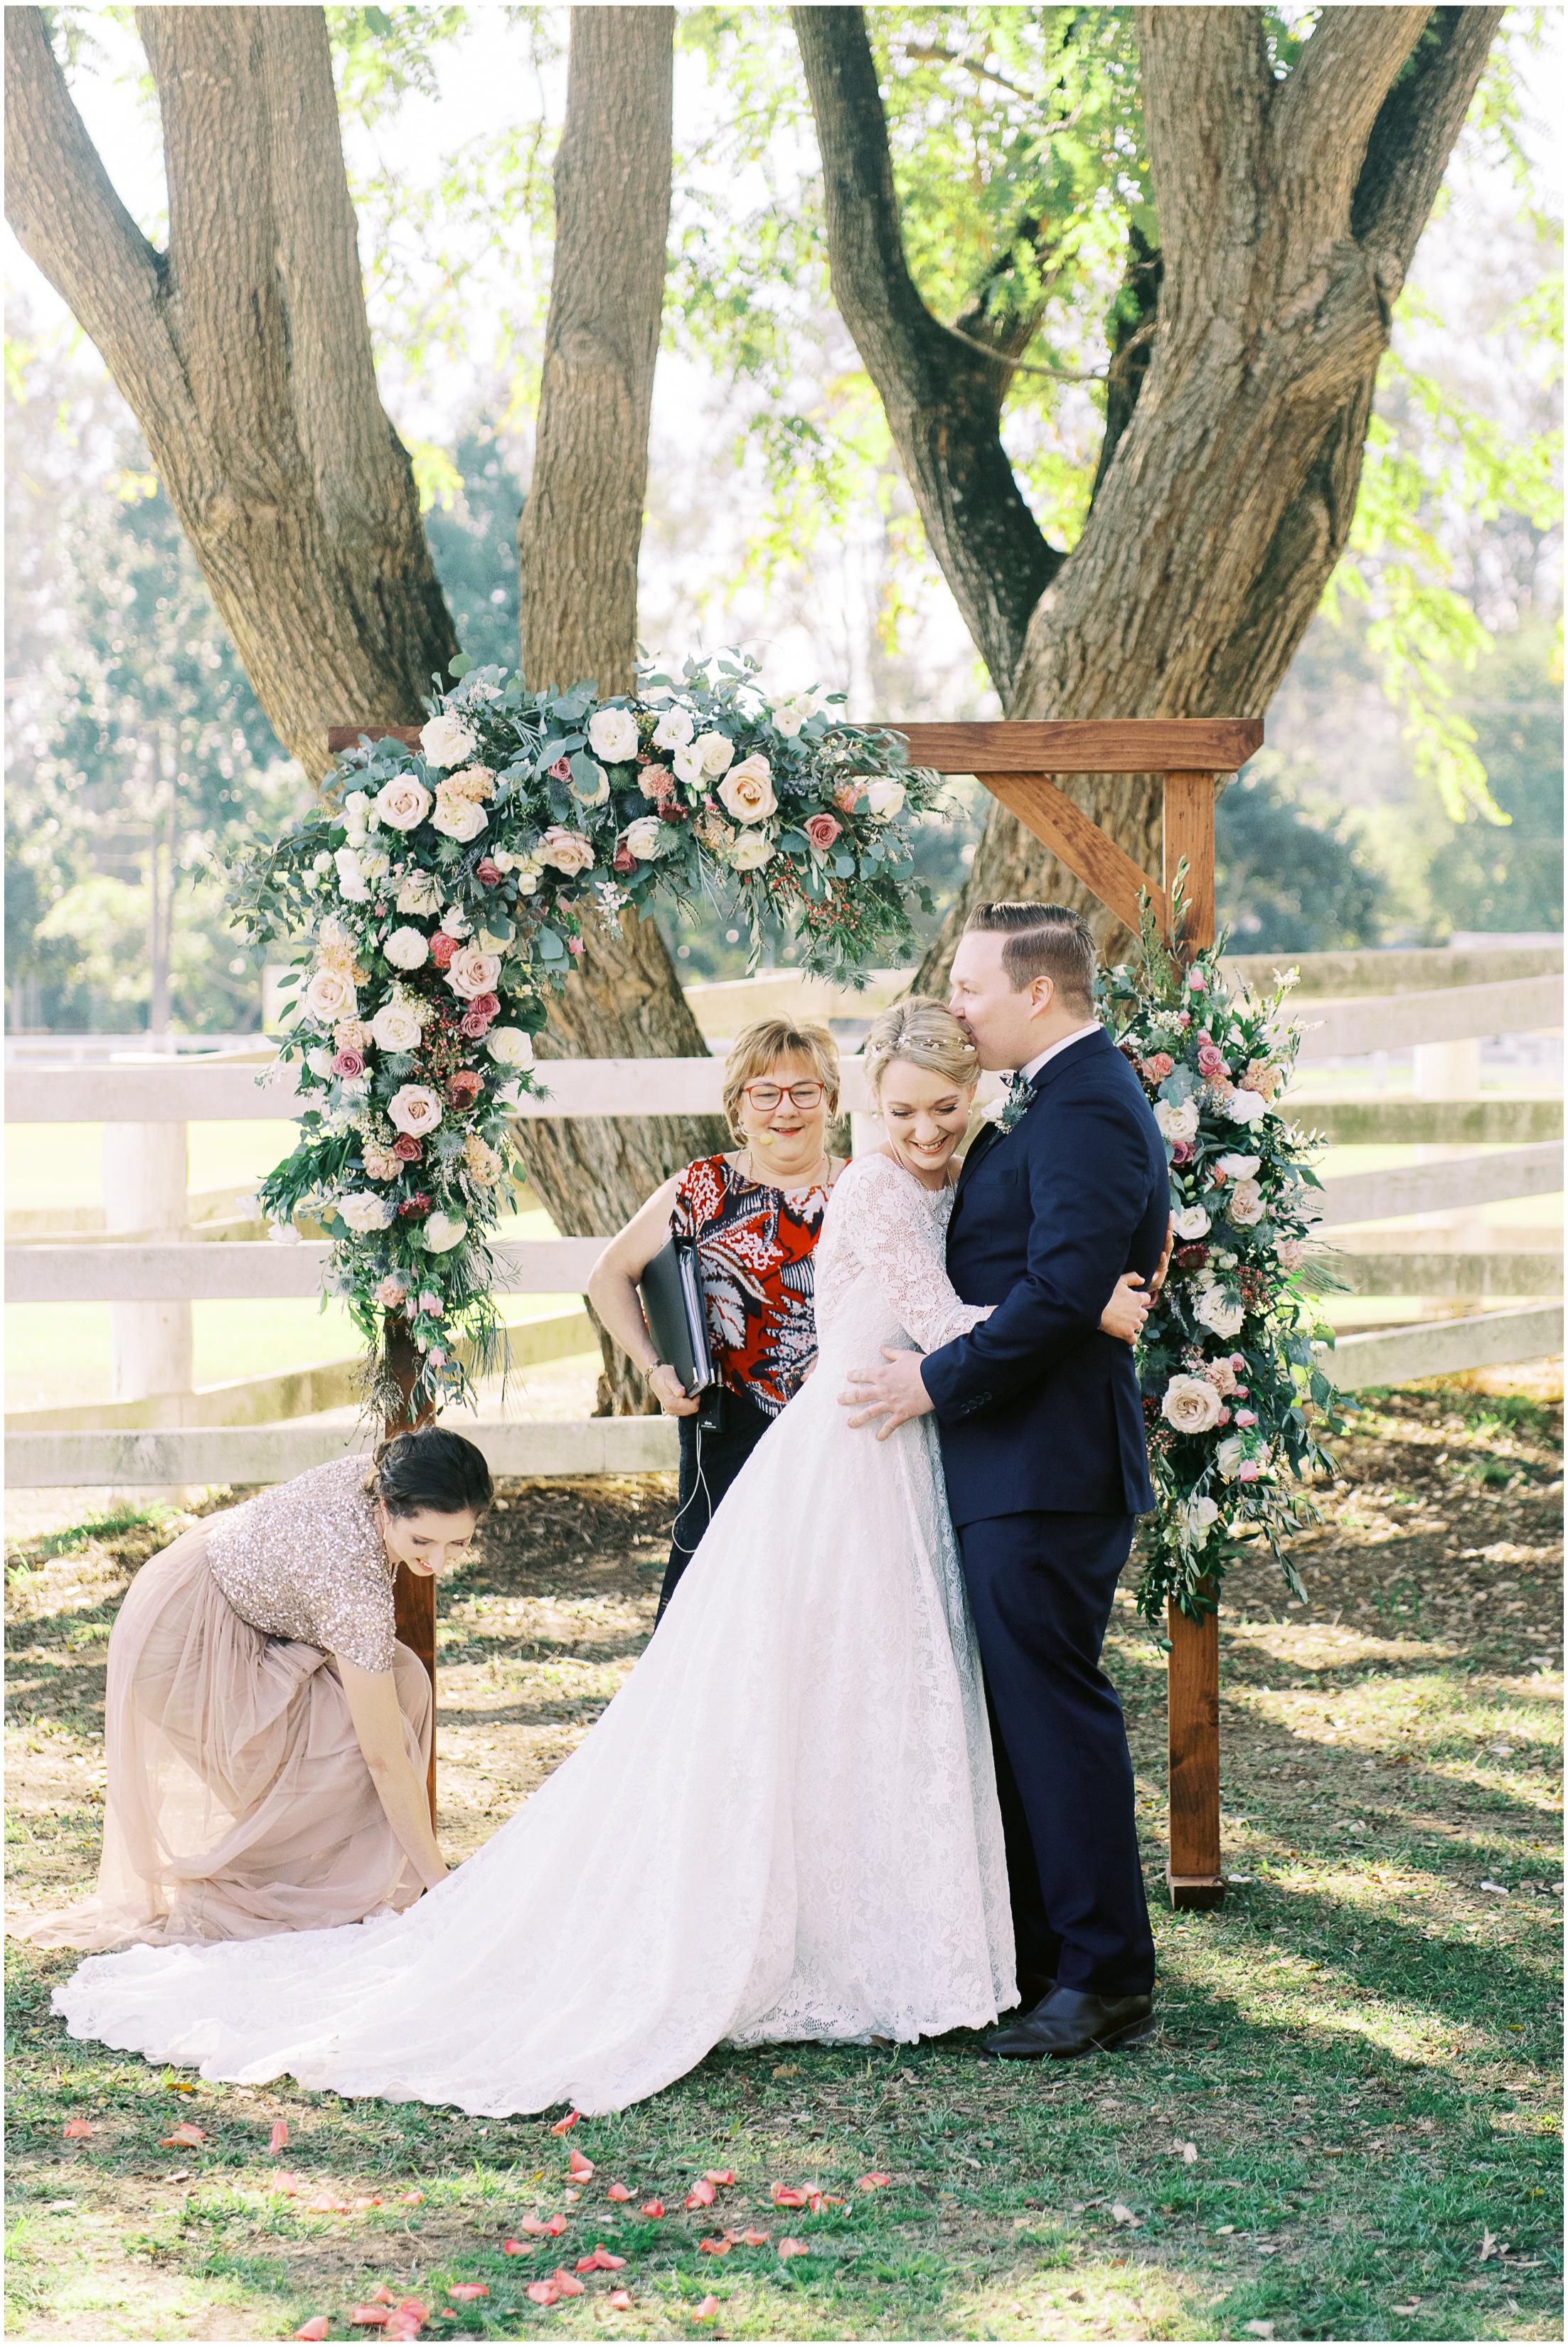 brisbane-fine-art-wedding-photographer-lauren-olivia-luxury-wedding-australia-06.jpg